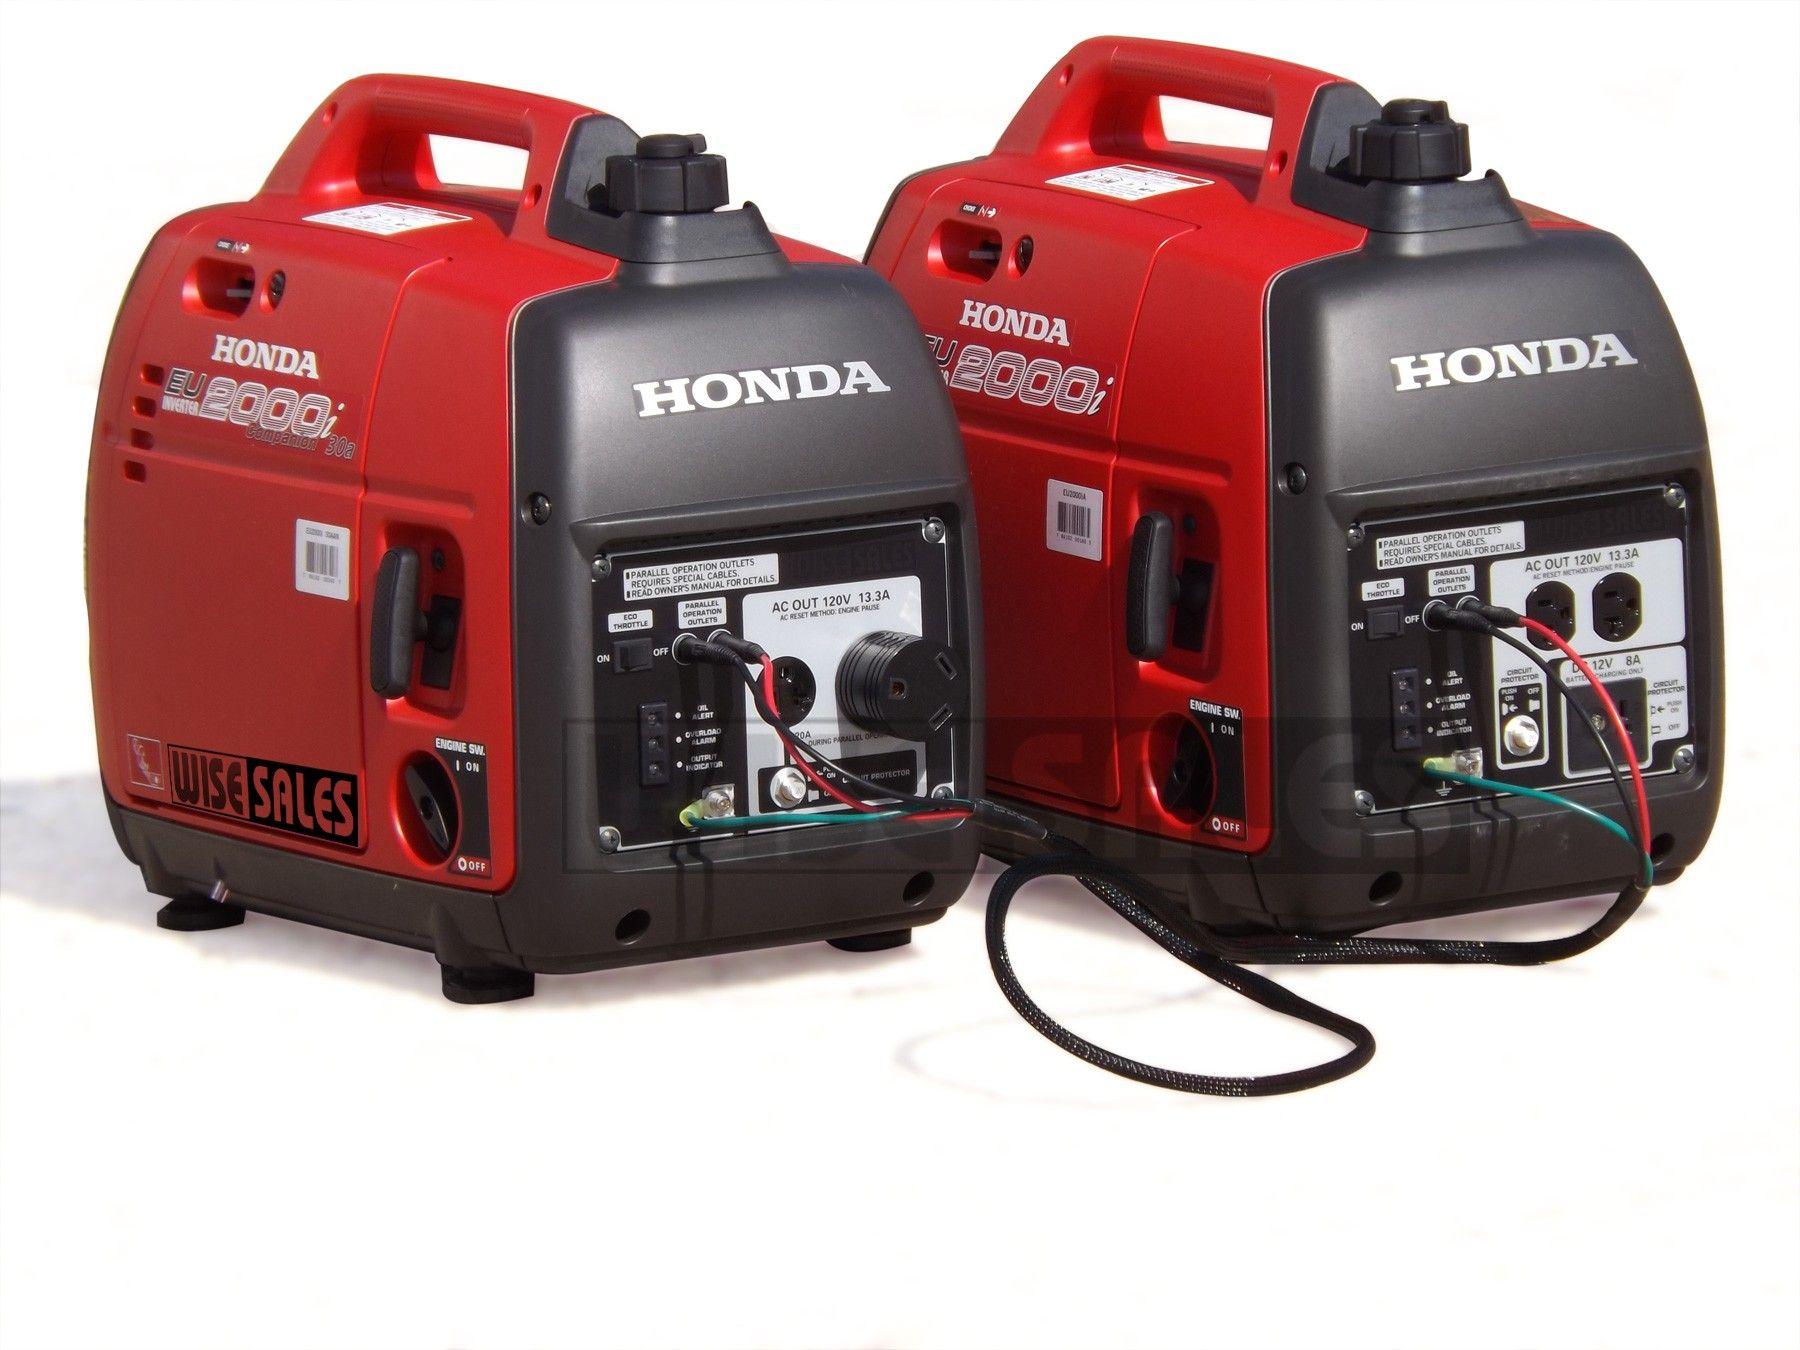 Honda Eu2000i Combo Package This Package Will Give You Full Use Of Your 30 Amp Rv Plug Honda S Eu2000i Generators For Sale Honda Generator Inverter Generator